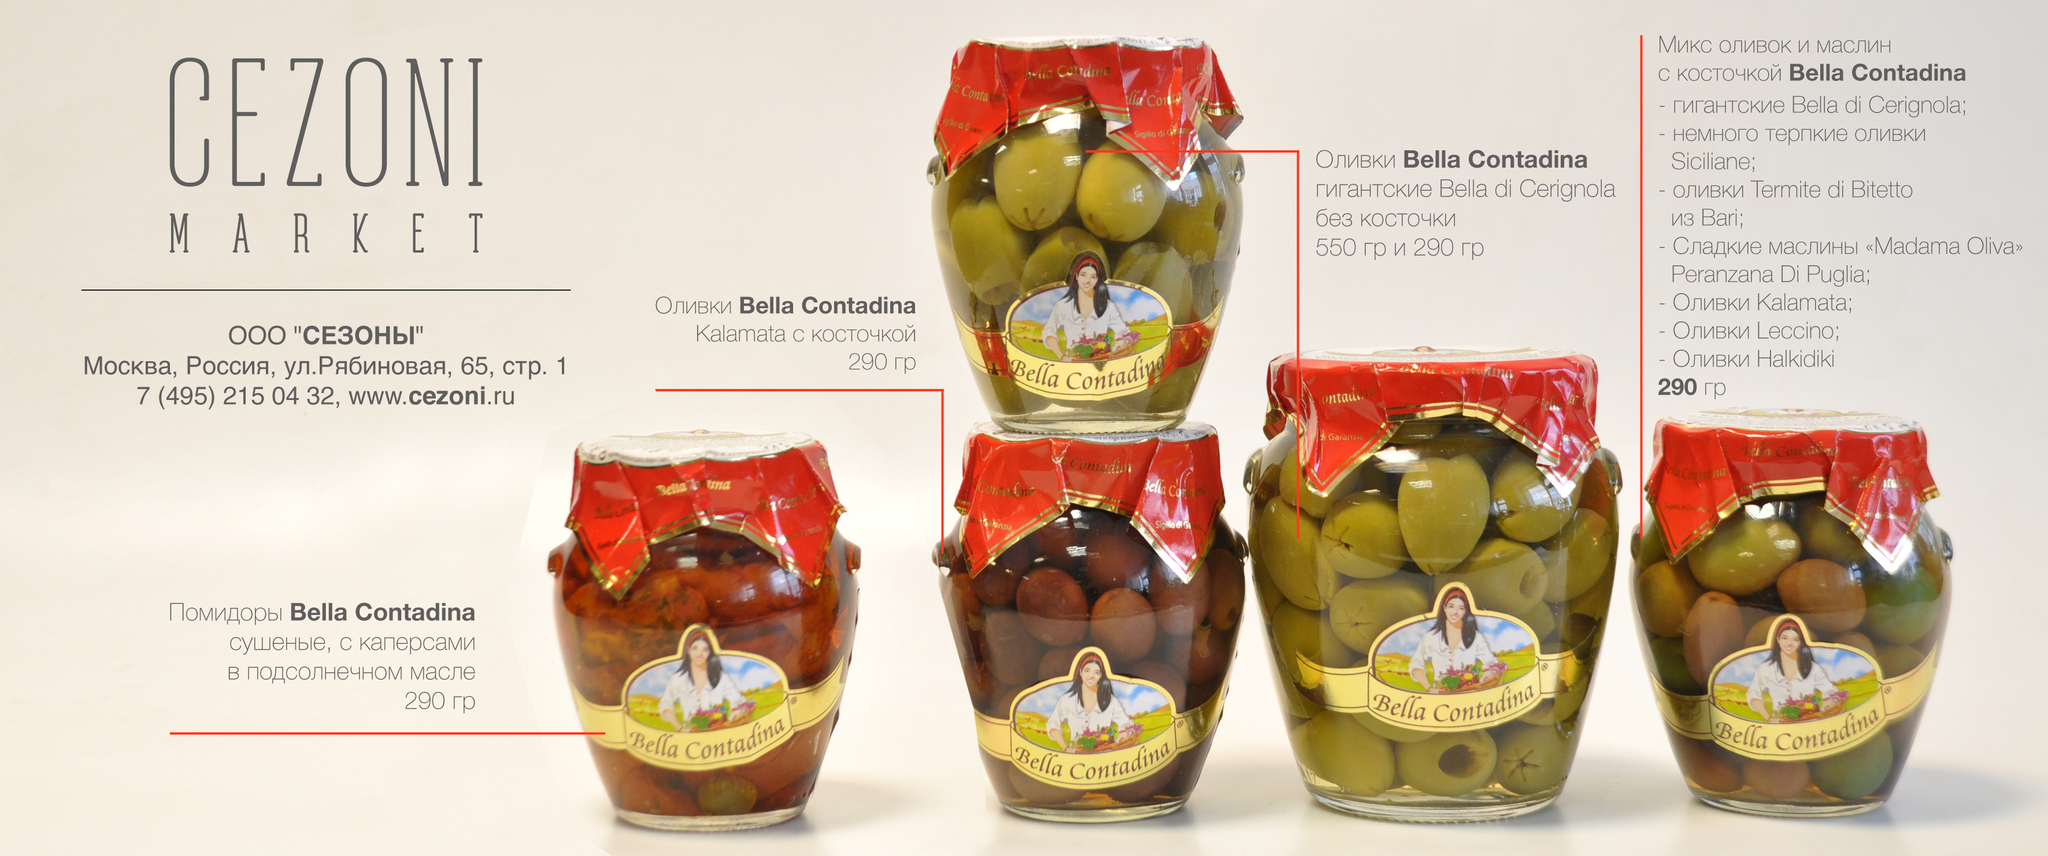 BC Оливки  гигантские без косточки амфора Bella Contadina 550 г